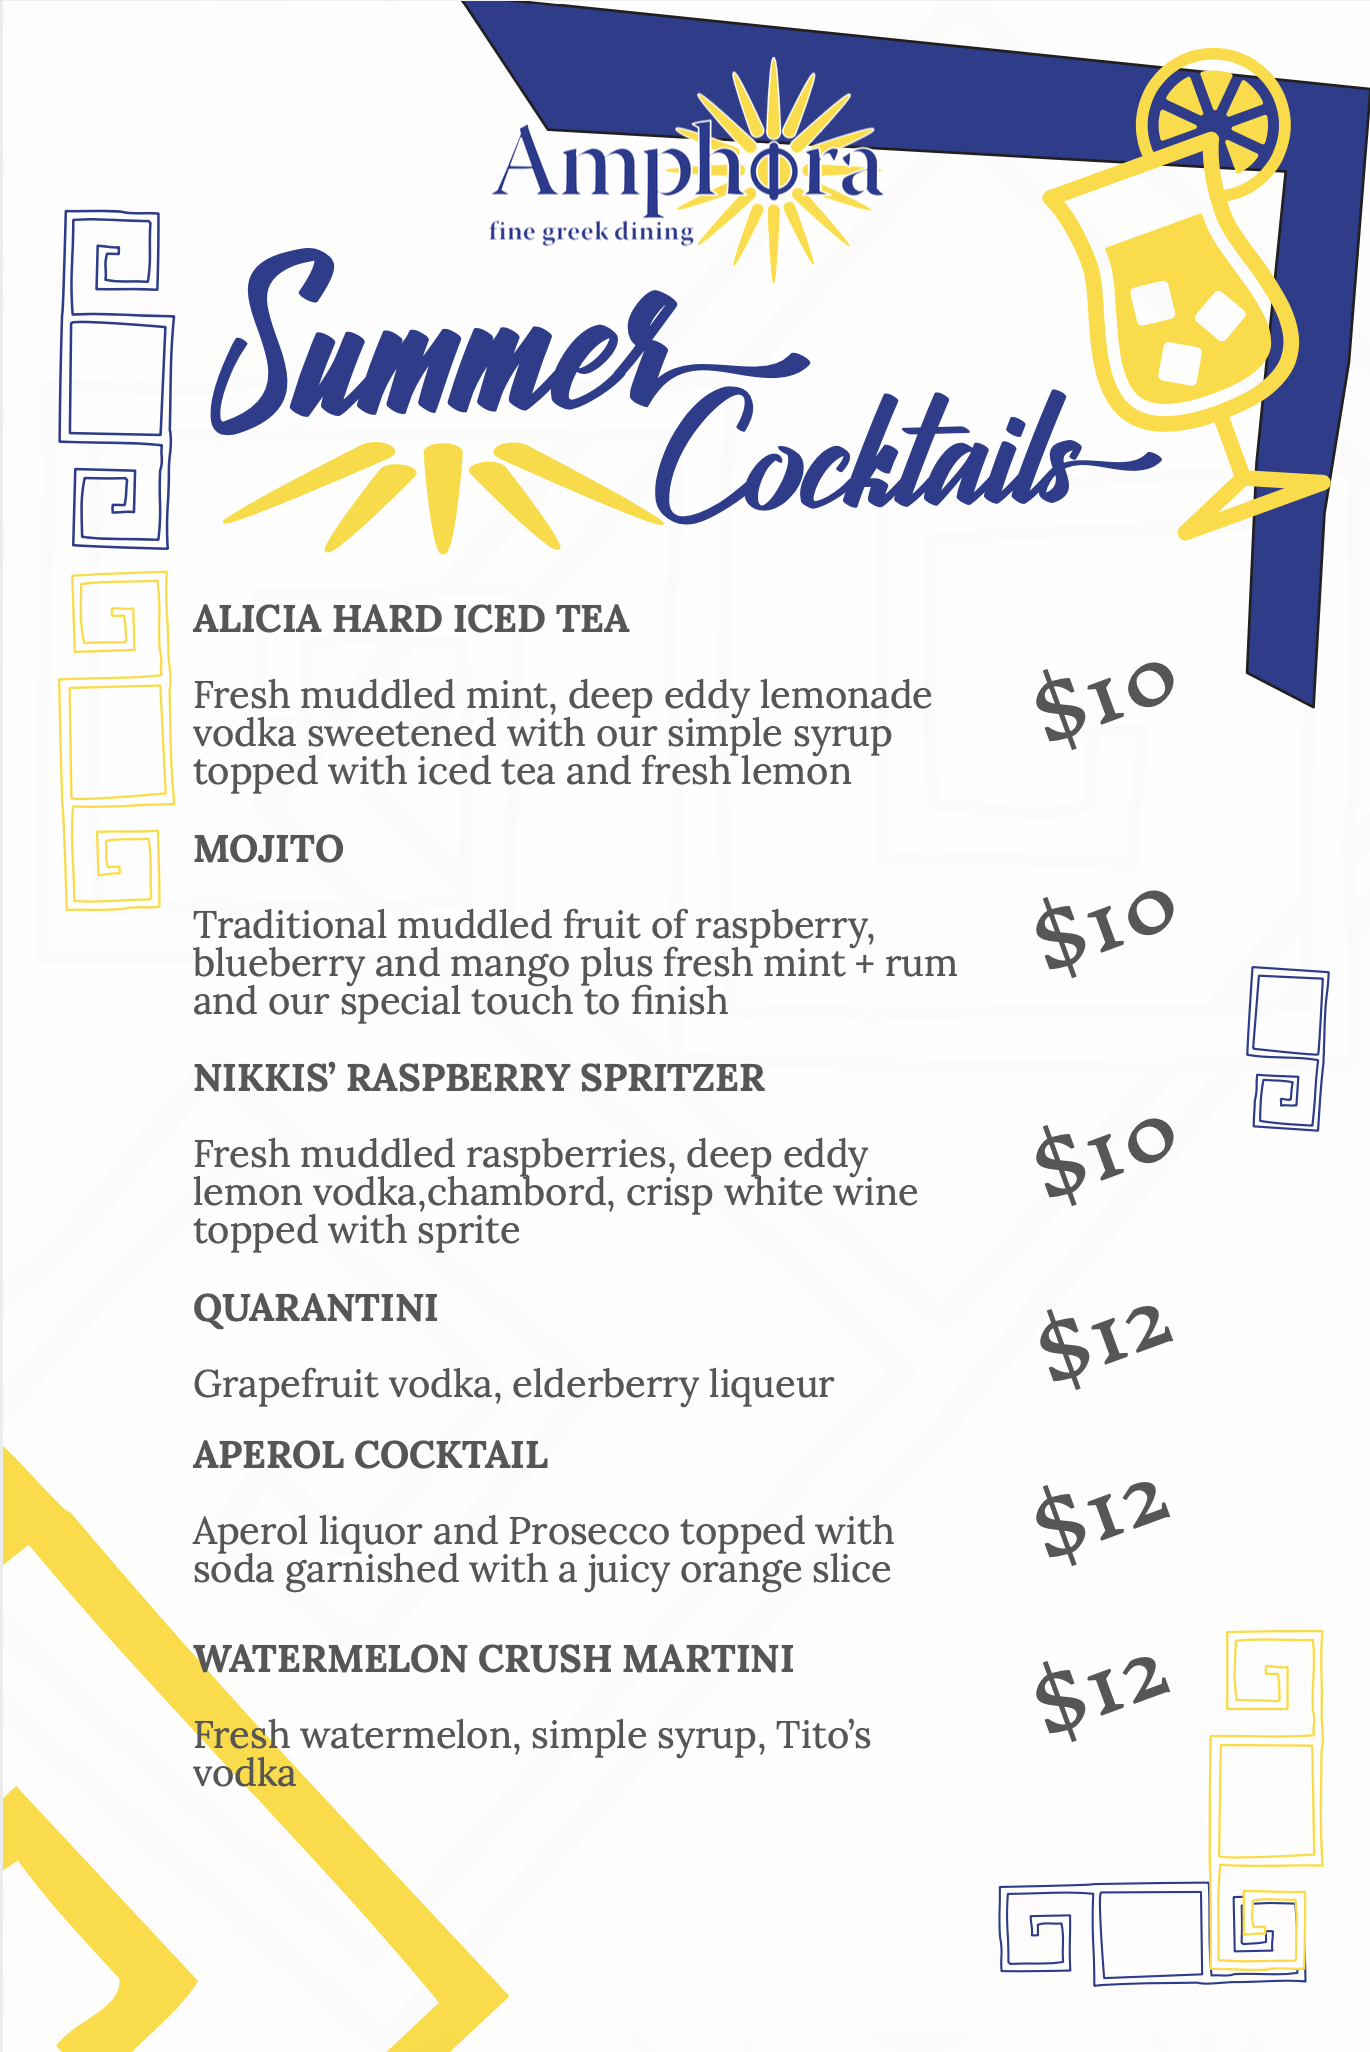 Amphora Summer Cocktail Menu